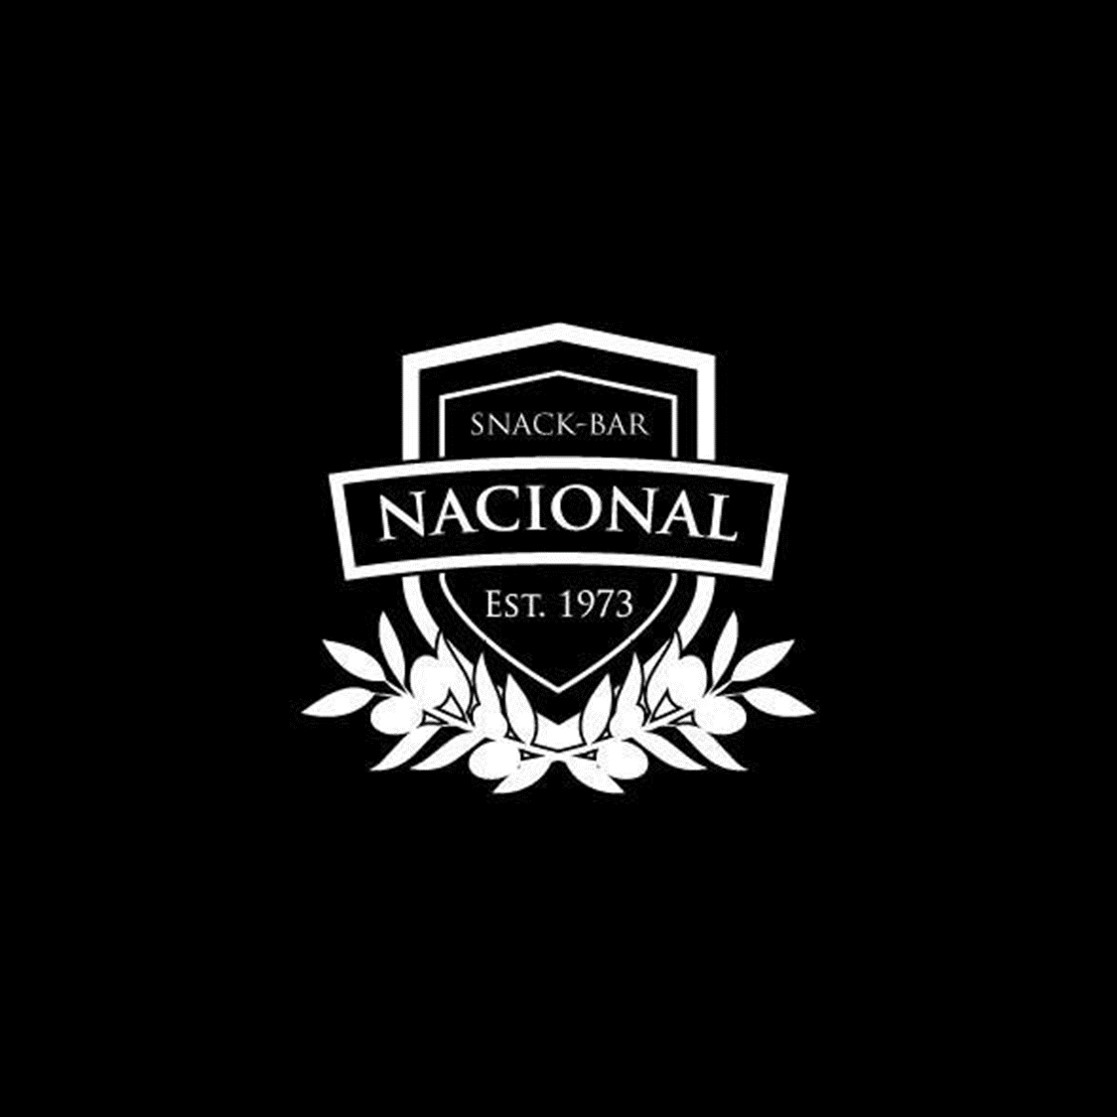 Snack Bar Nacional